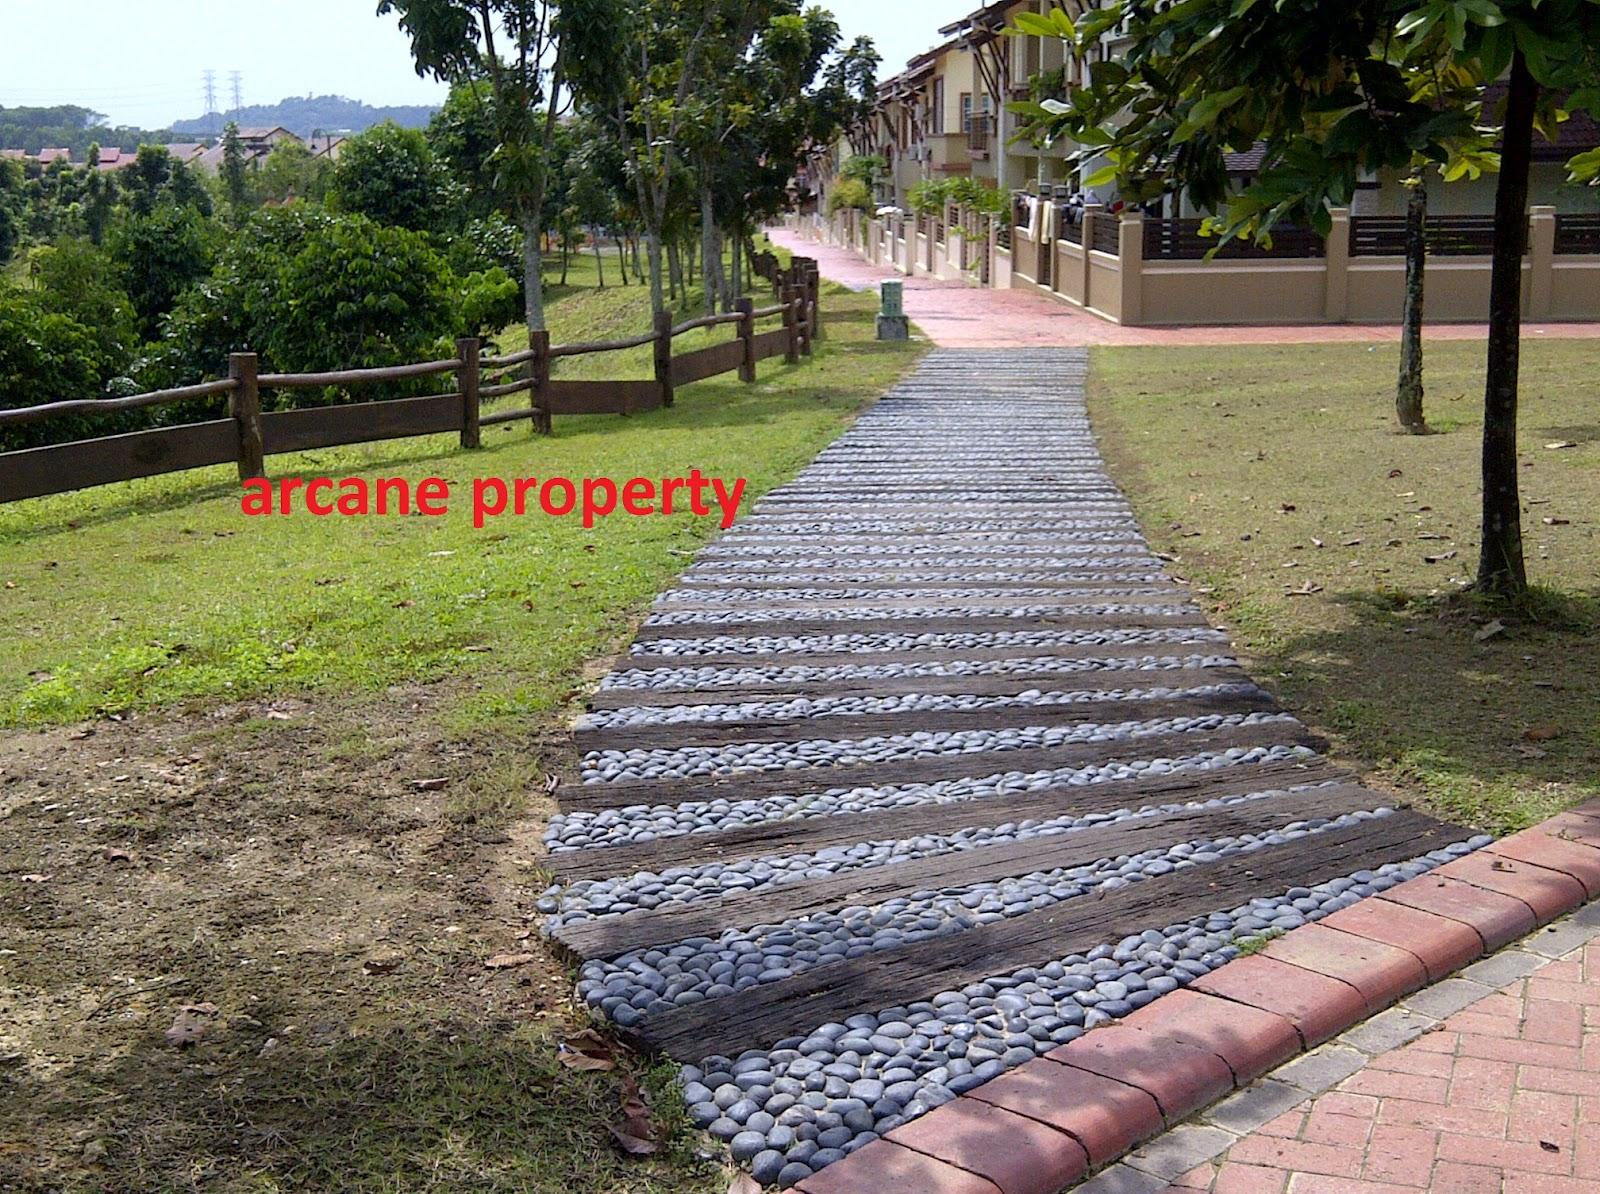 Property for sale in denai alam terrace house in denai for Terrace jogging track